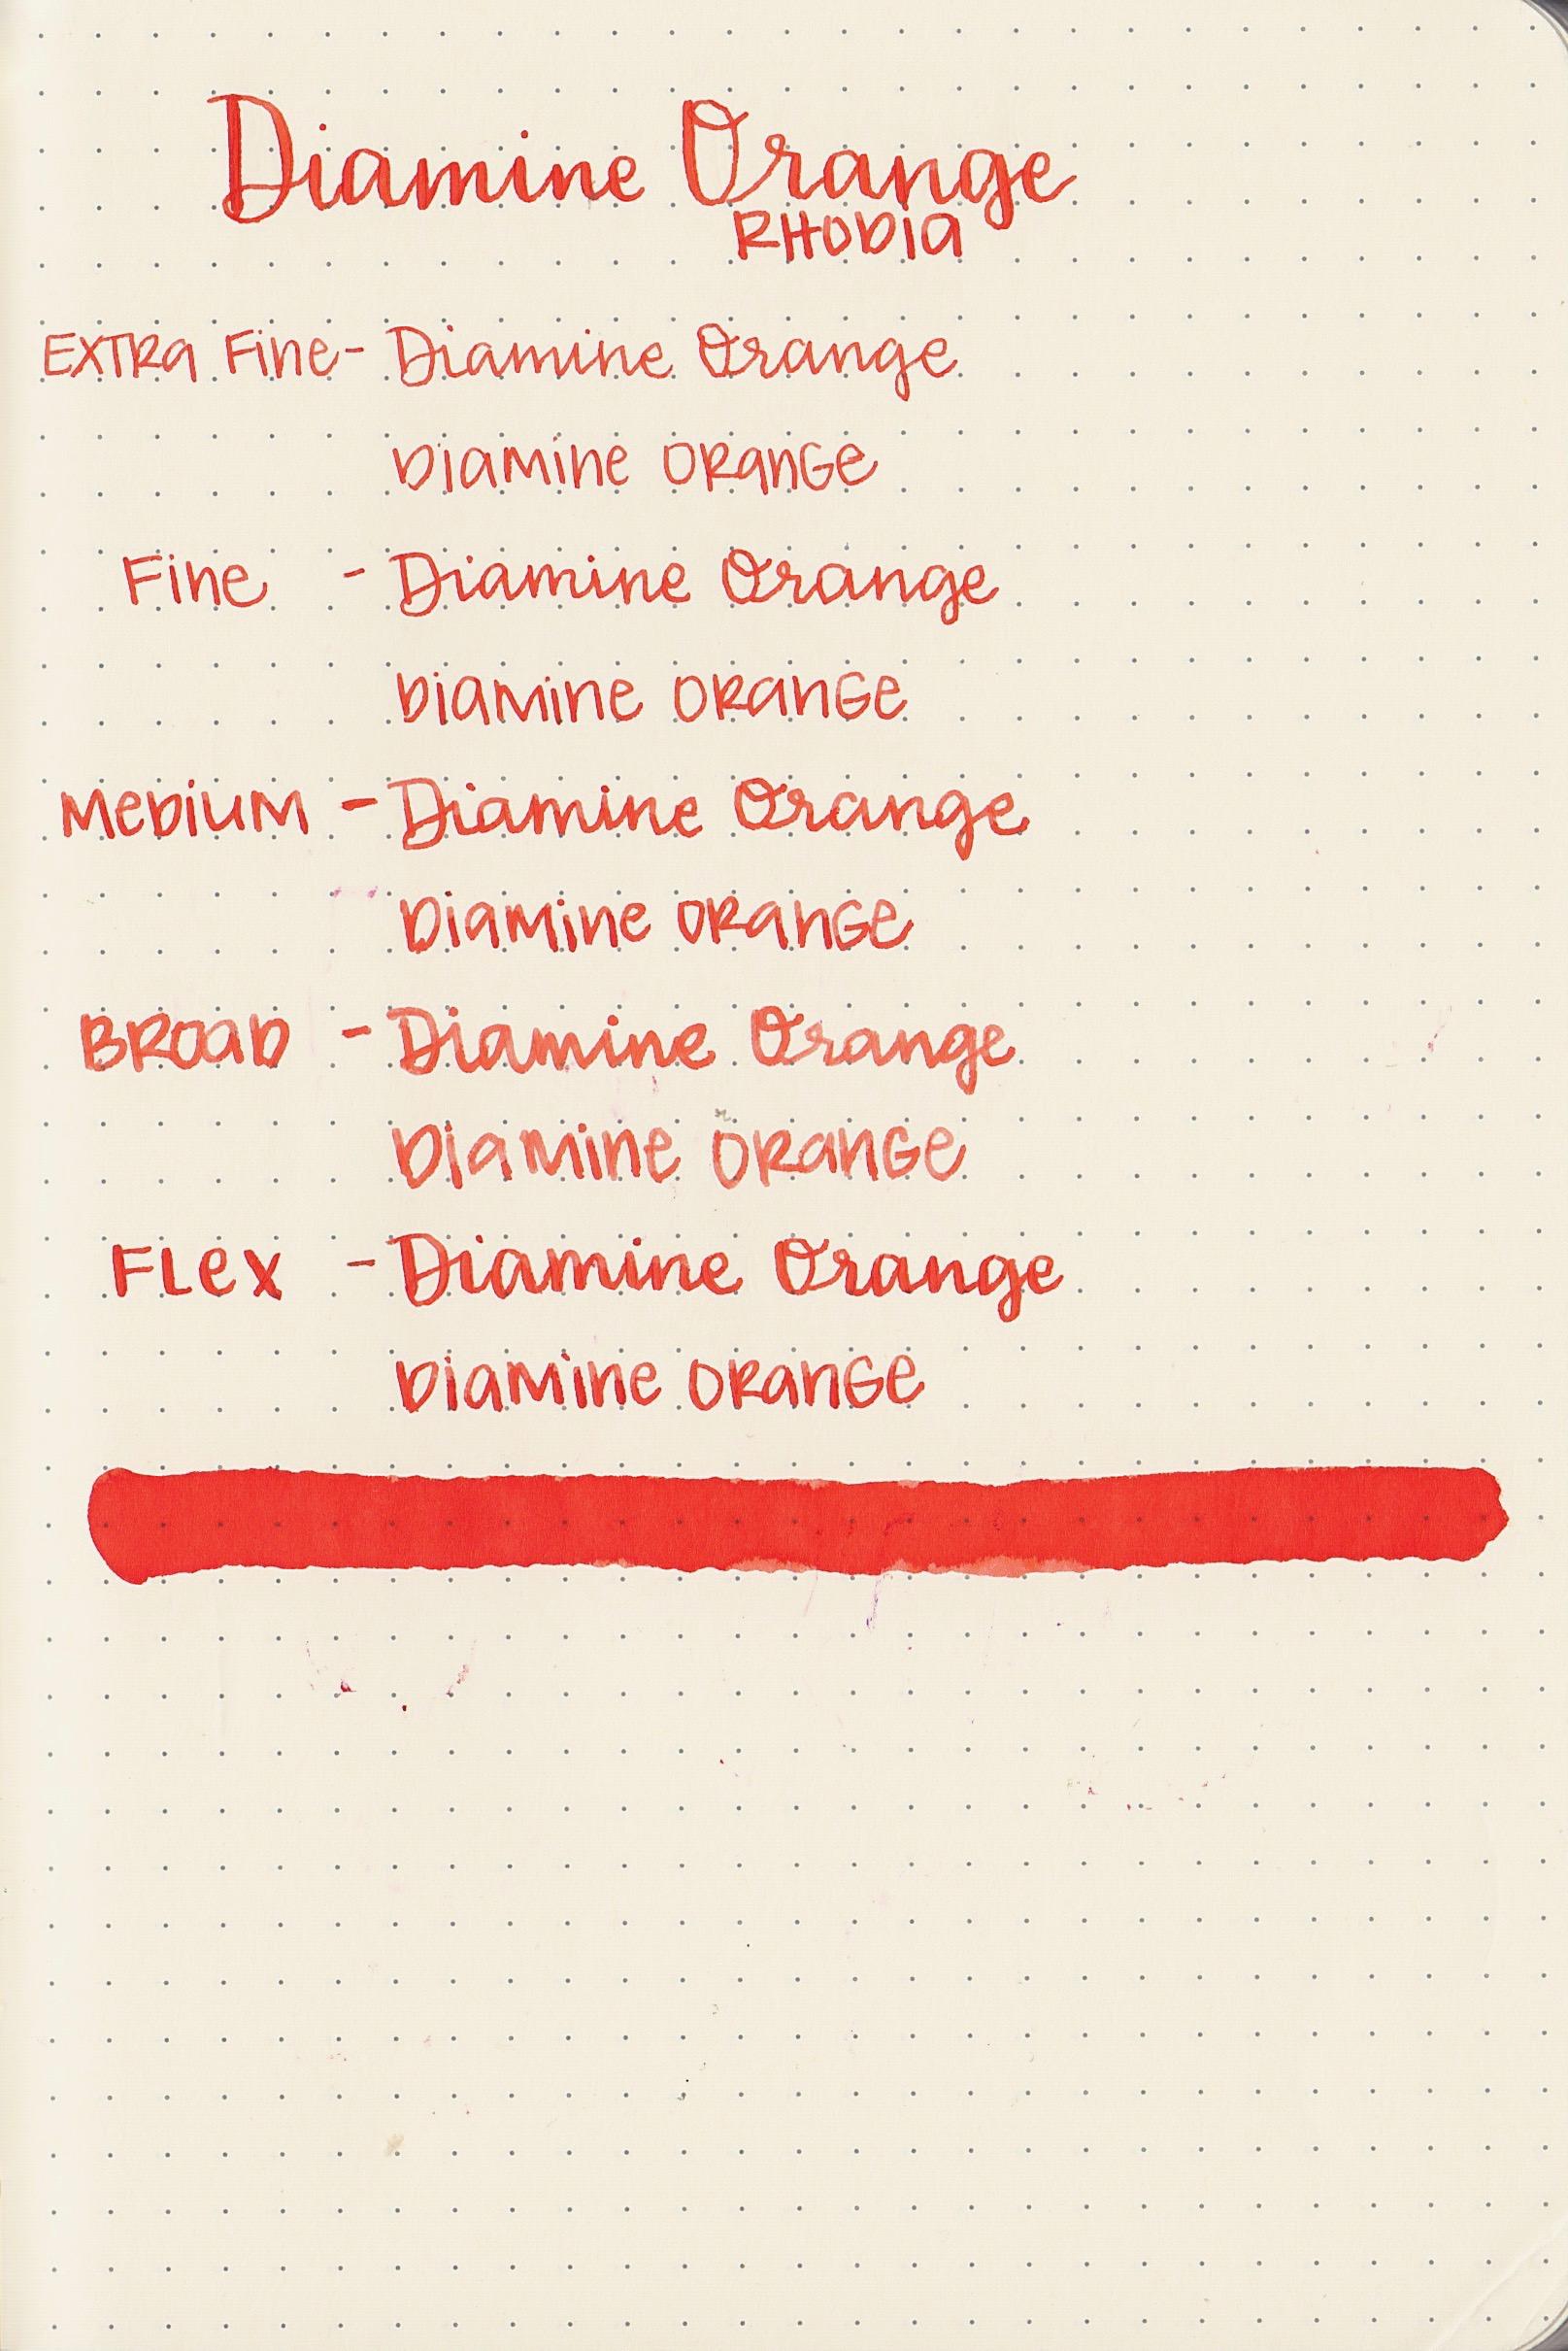 DiamineOrange - 15.jpg